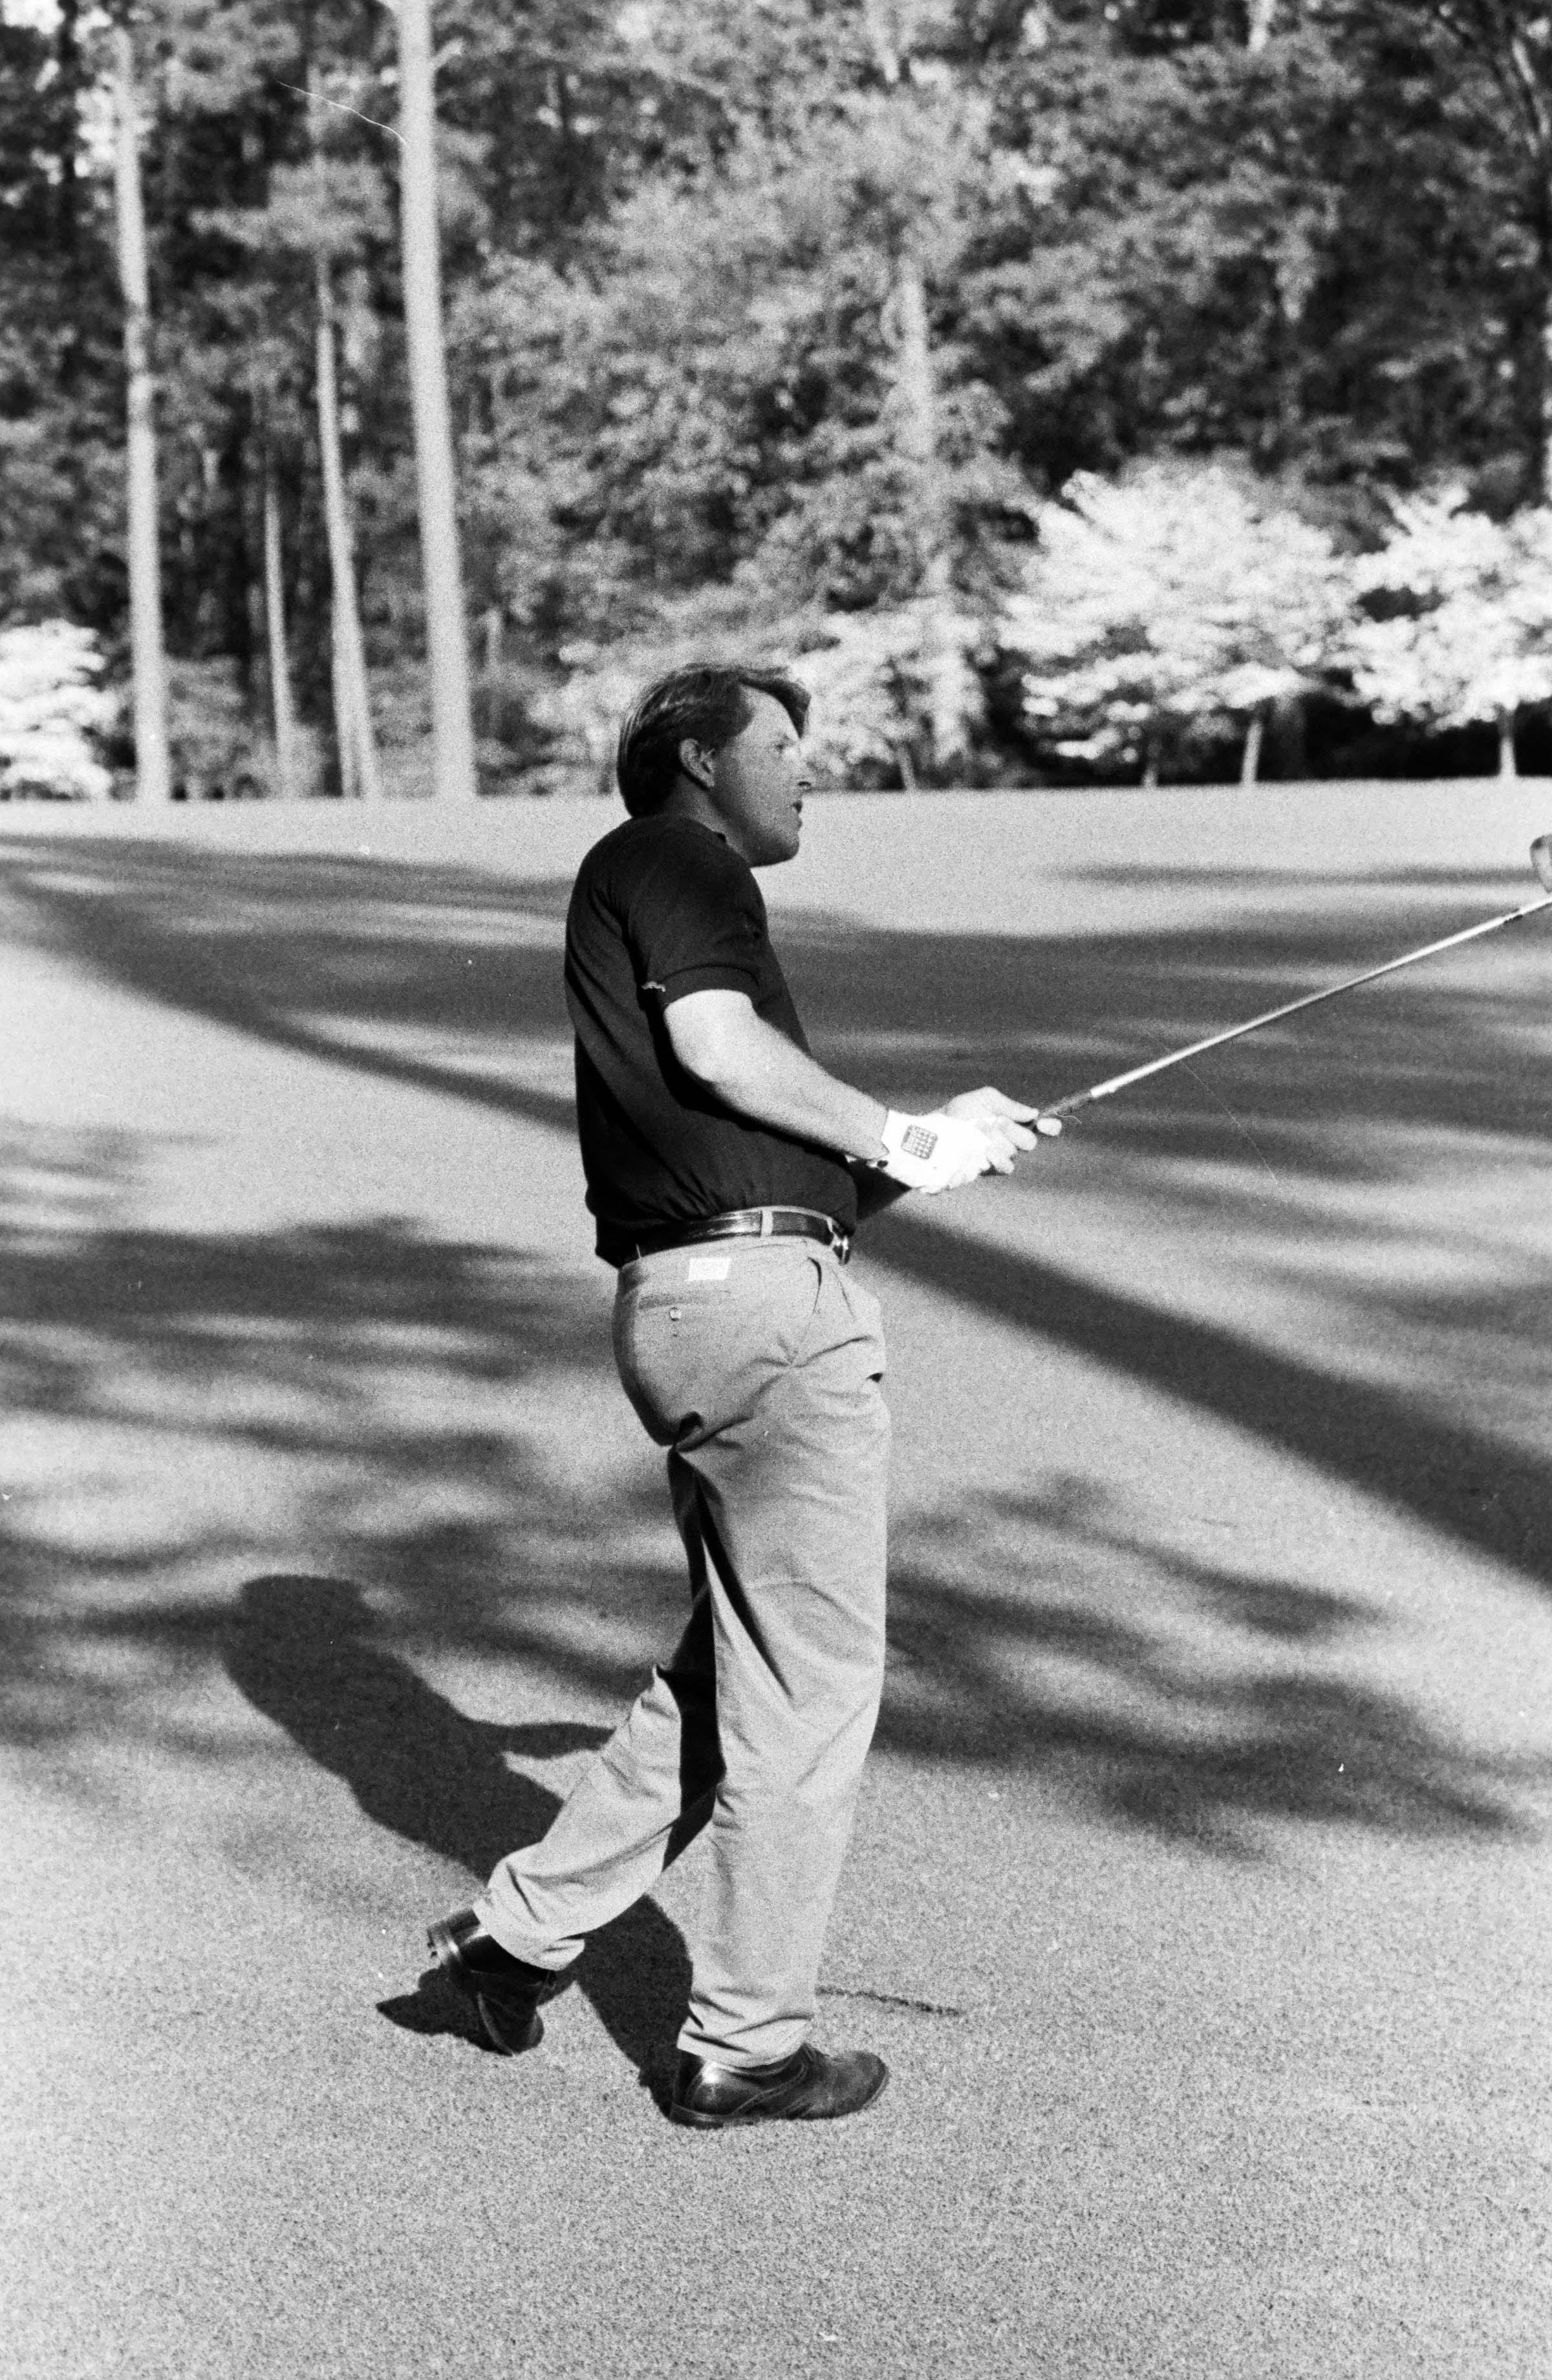 1990 - Phil Mickelson, Arizona State